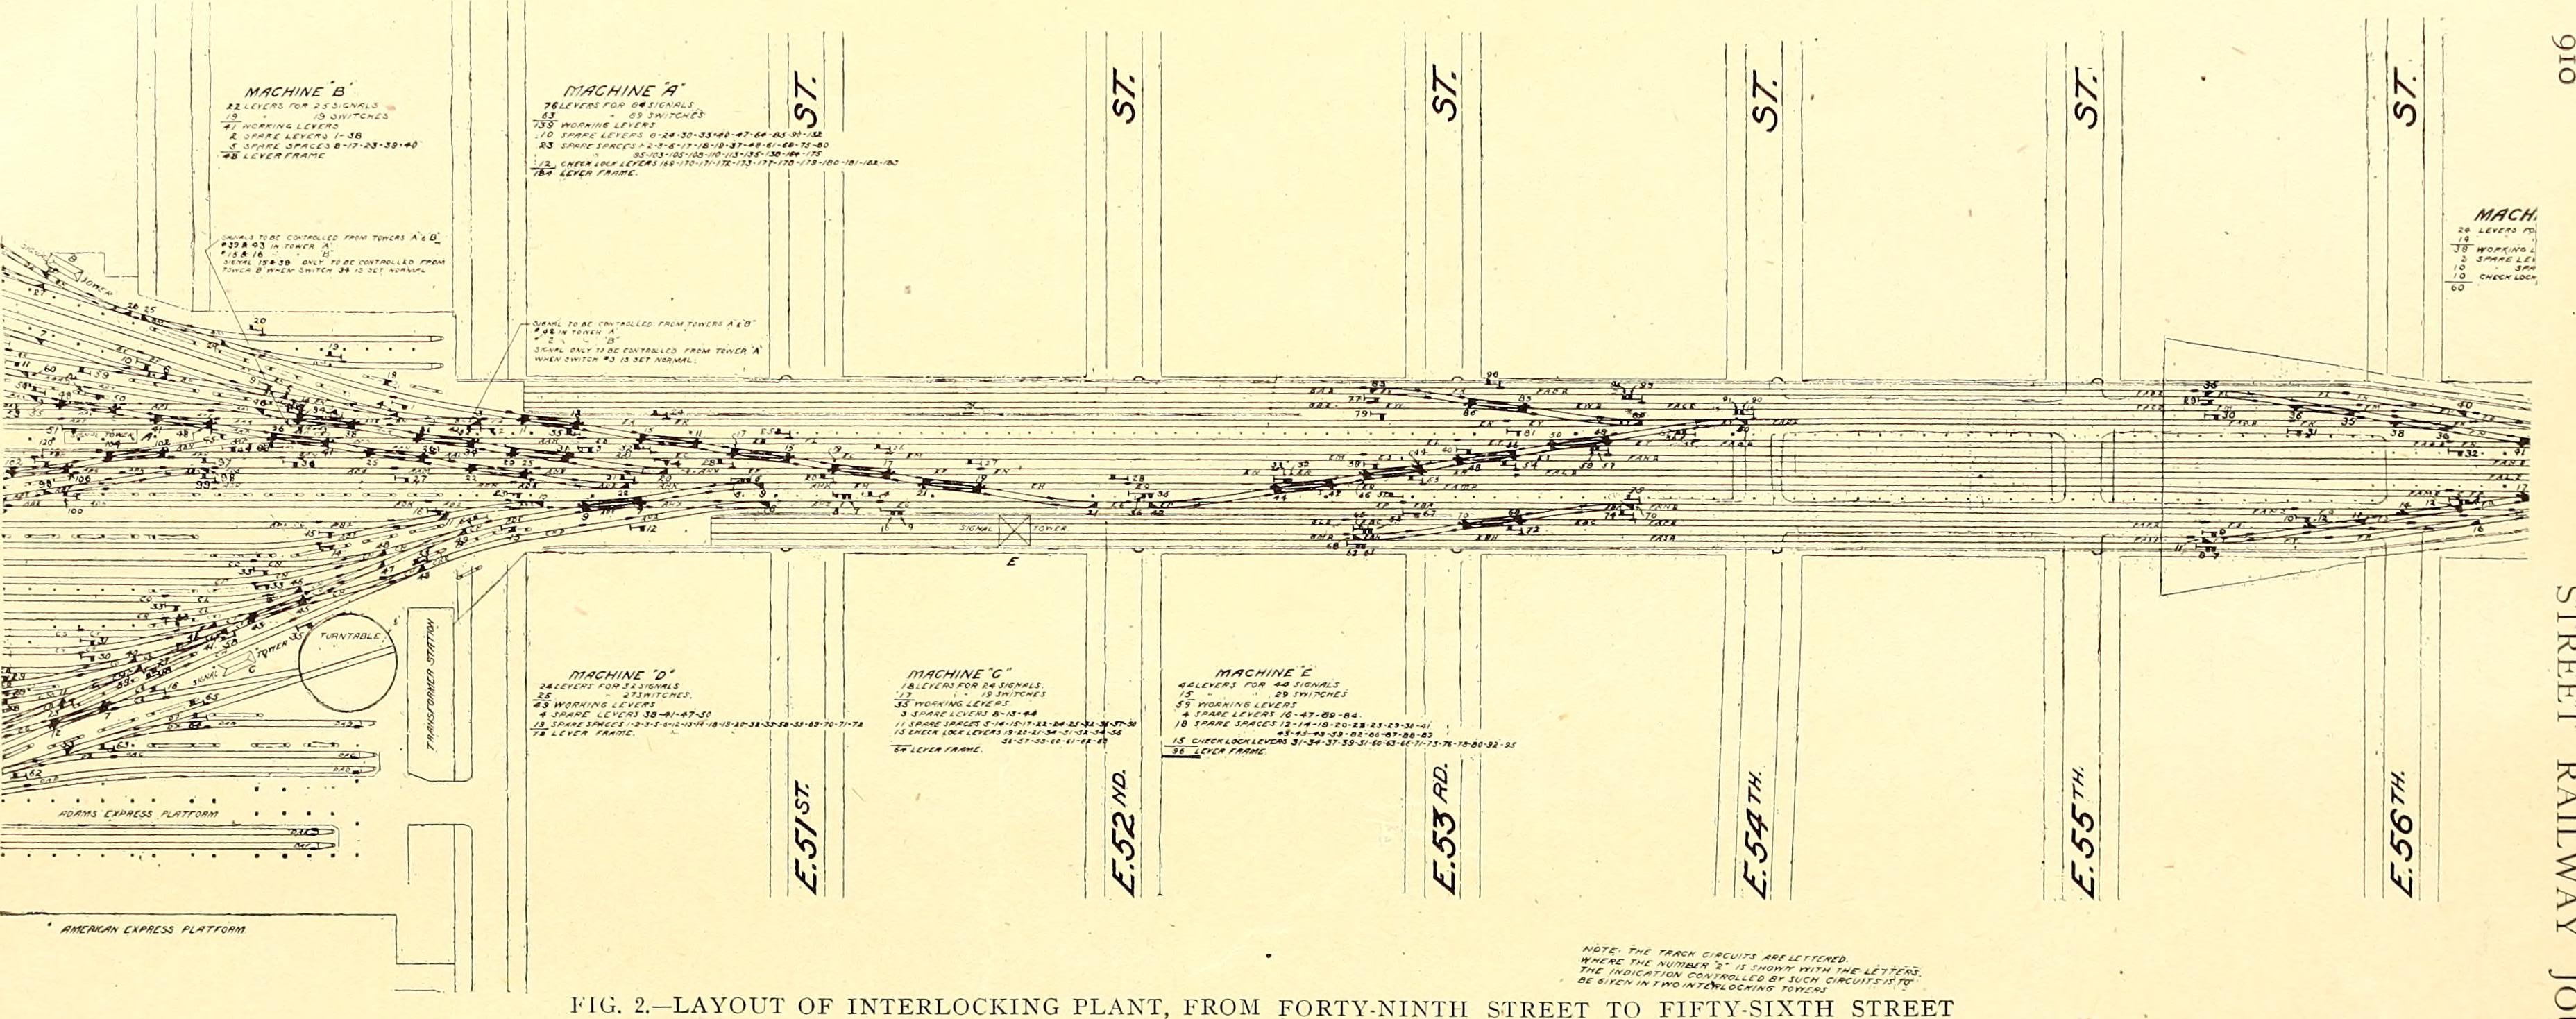 File:The Street railway journal (1906) (14758793494) jpg